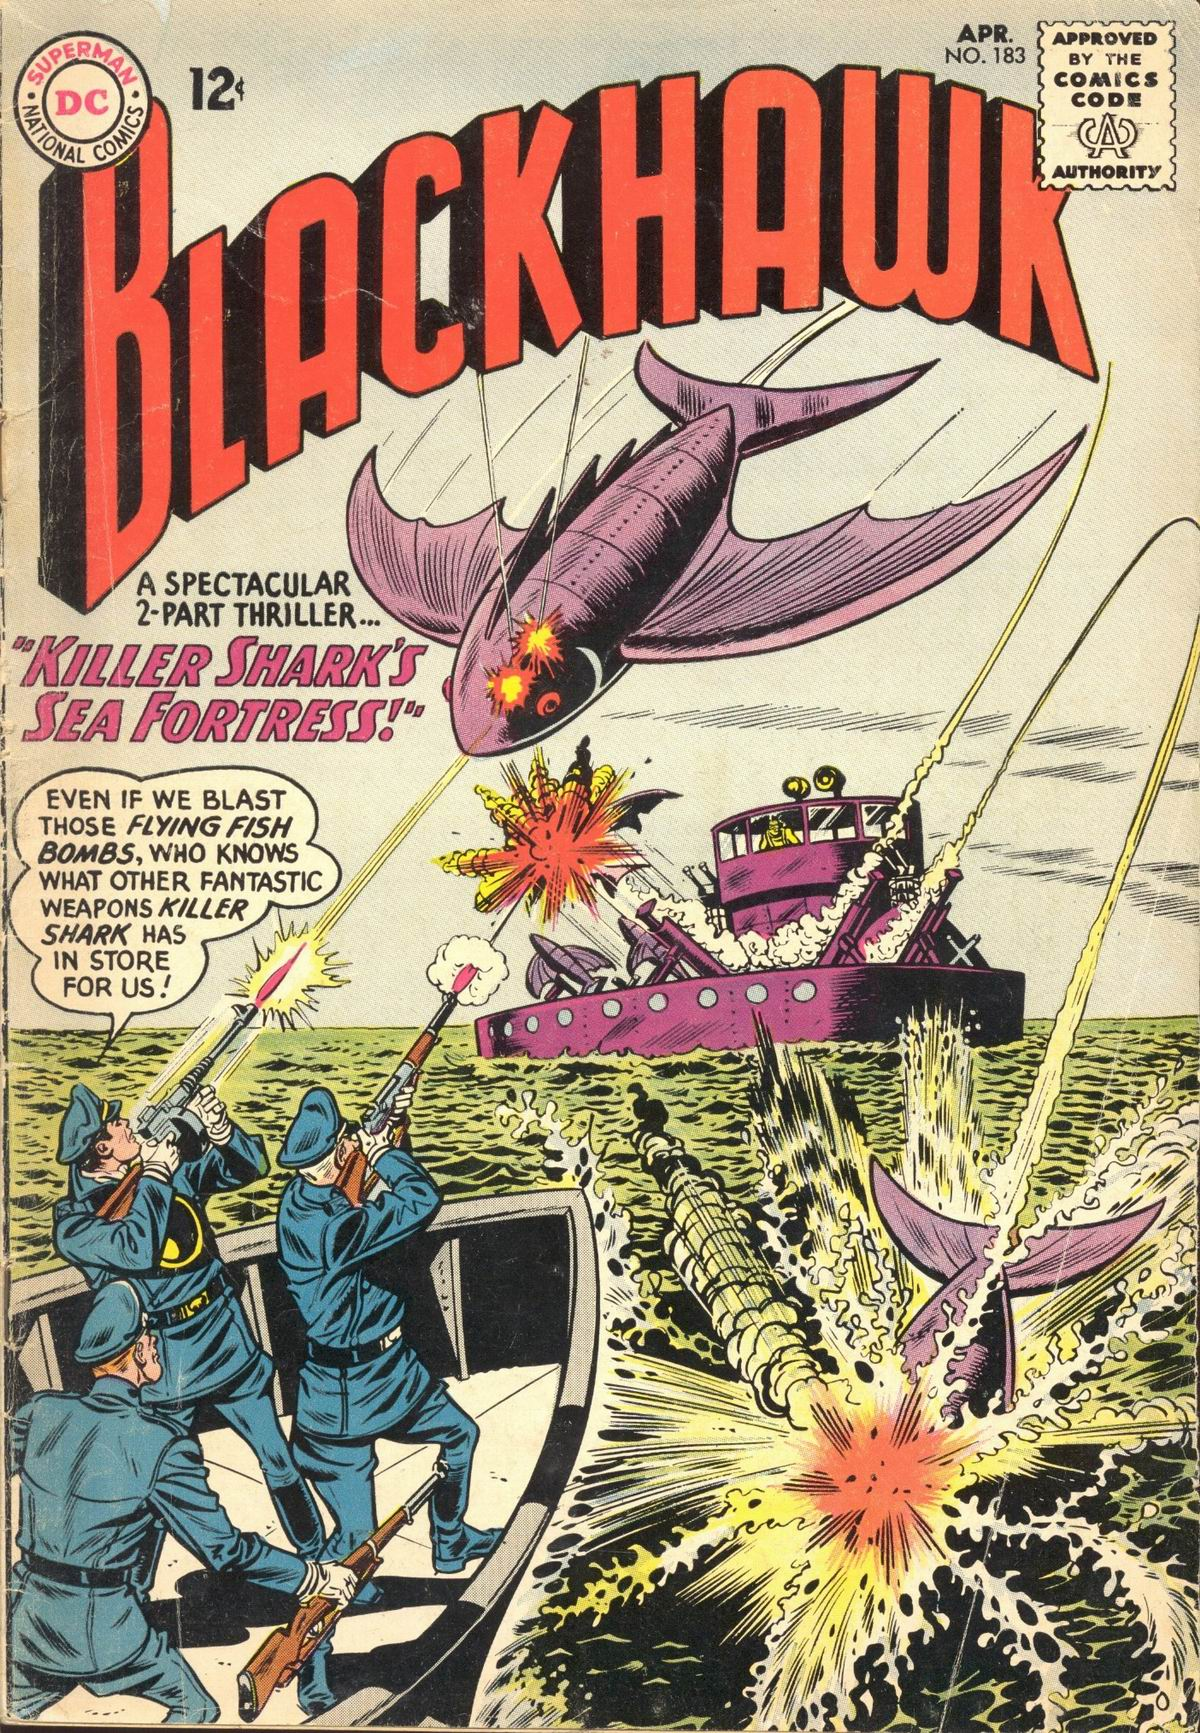 Blackhawk (1957) 183 Page 1